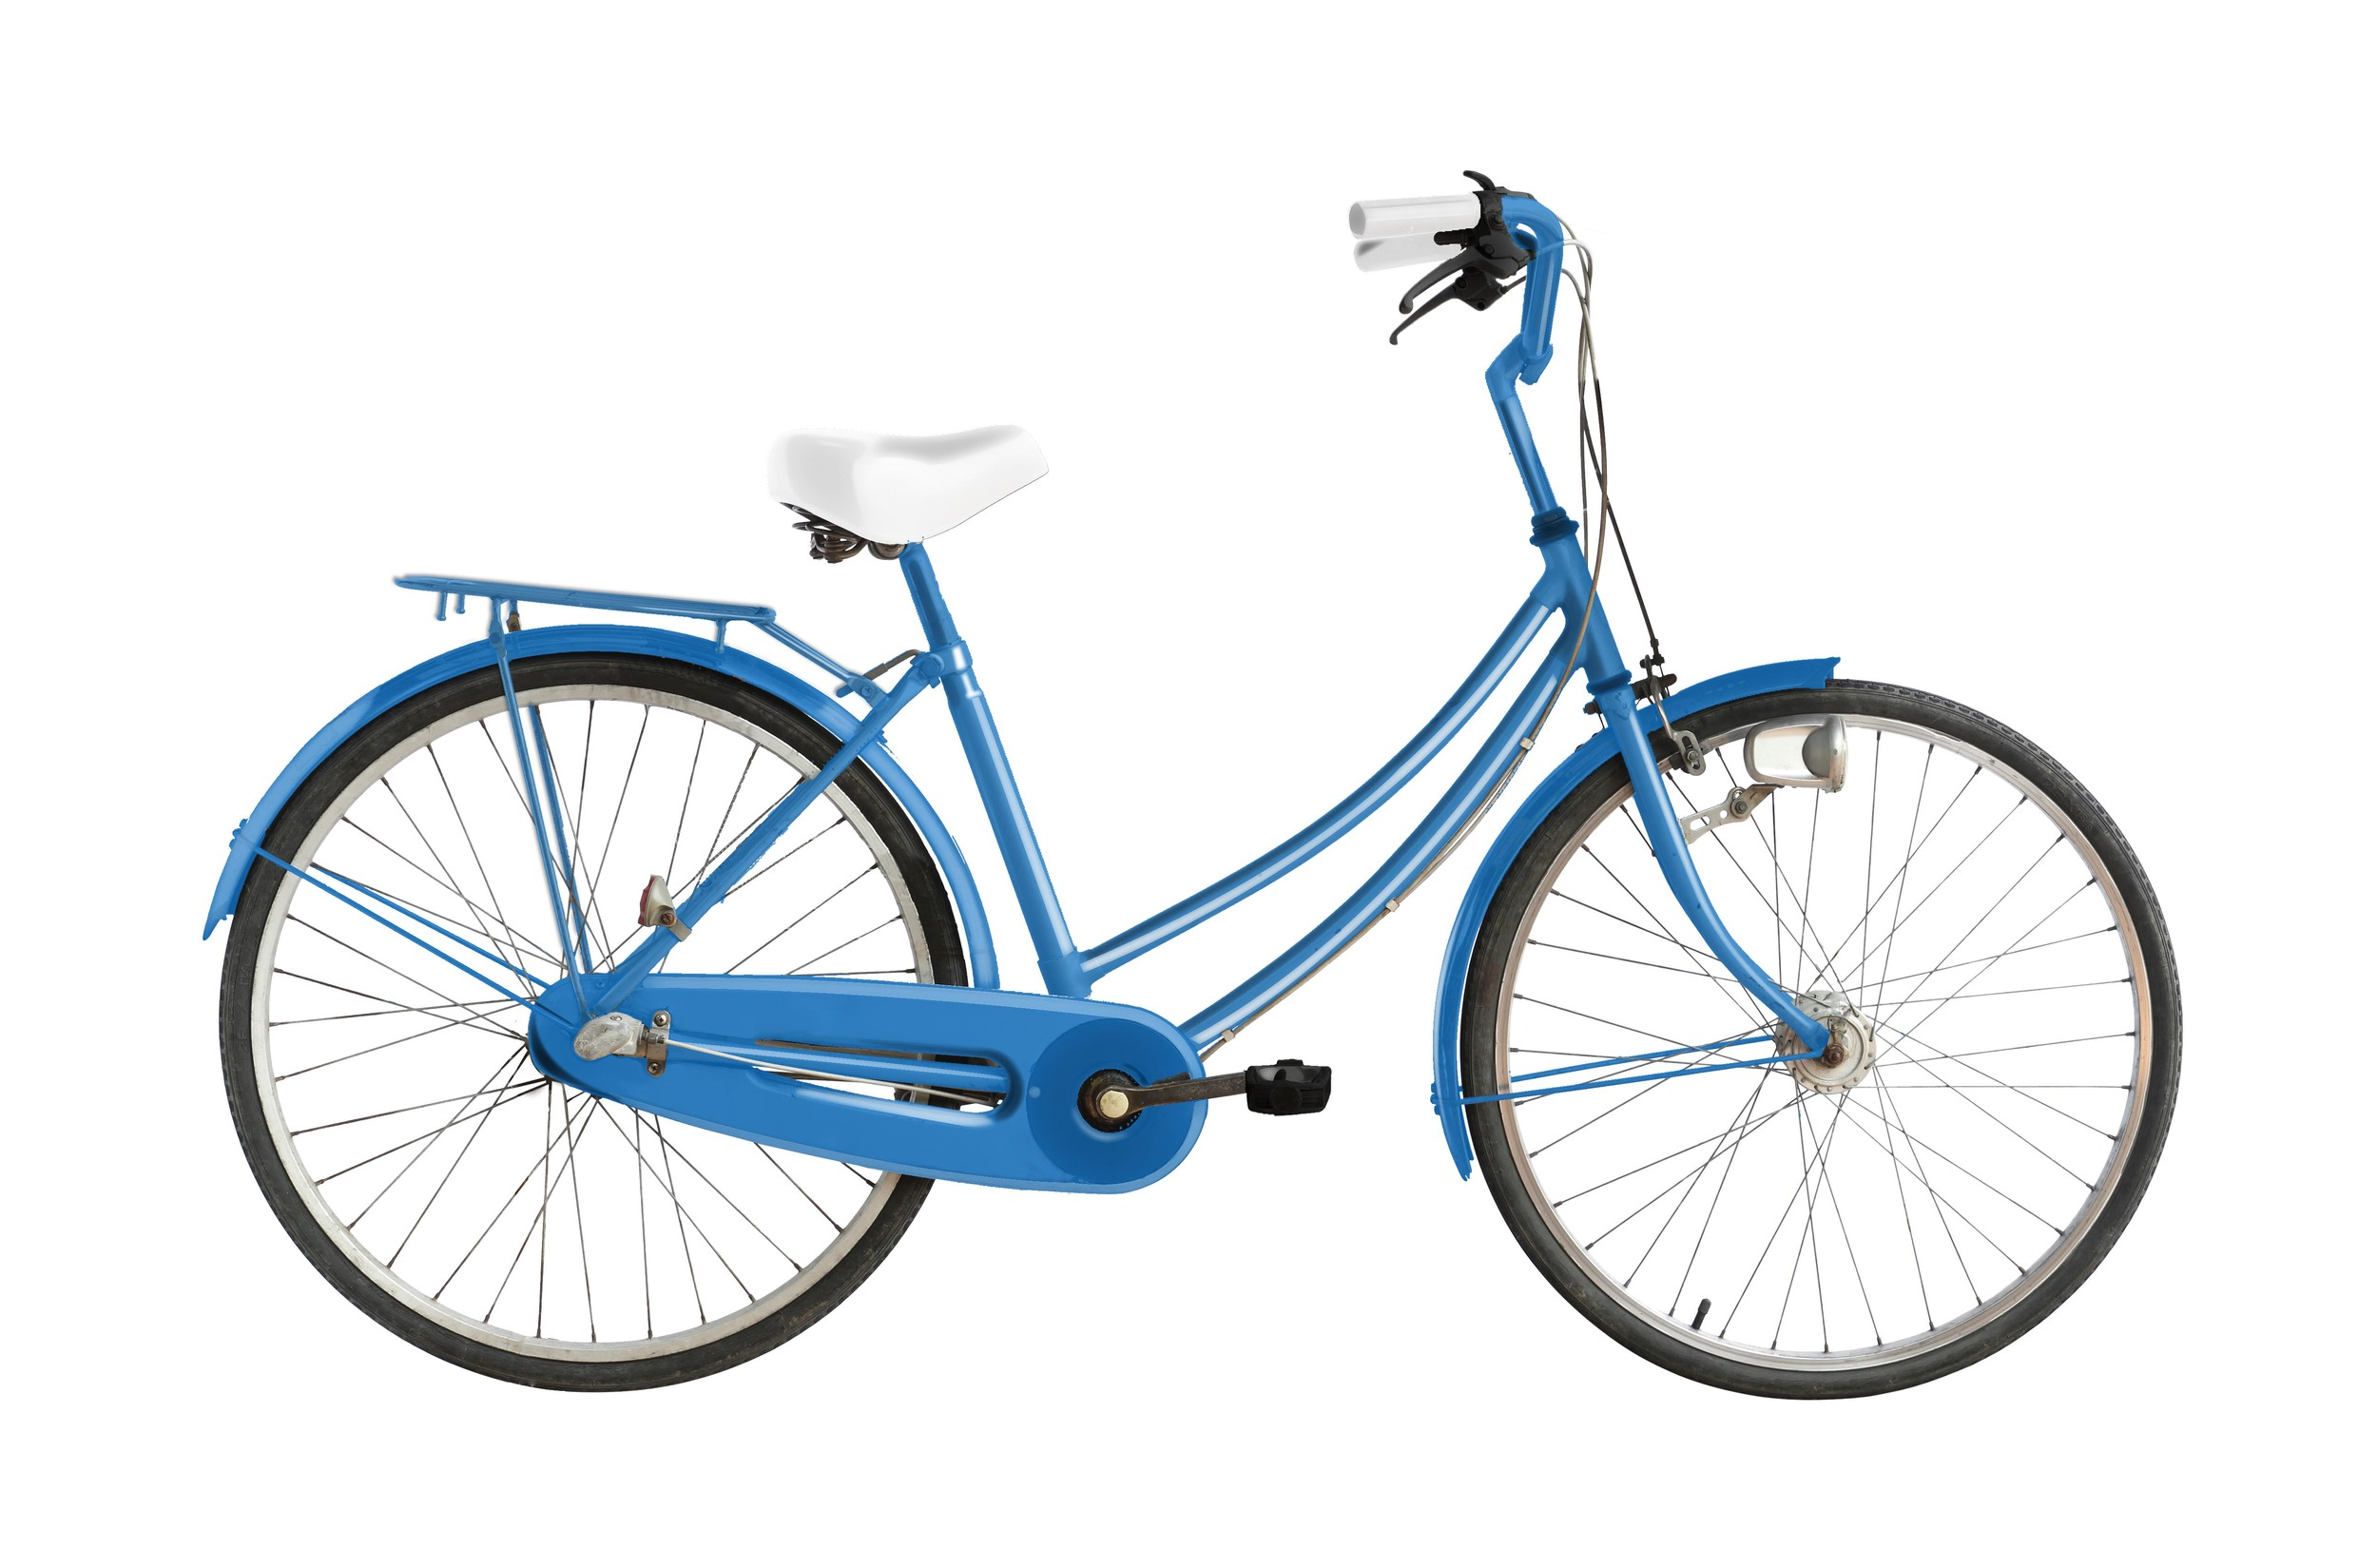 Xmas blue bike.jpg